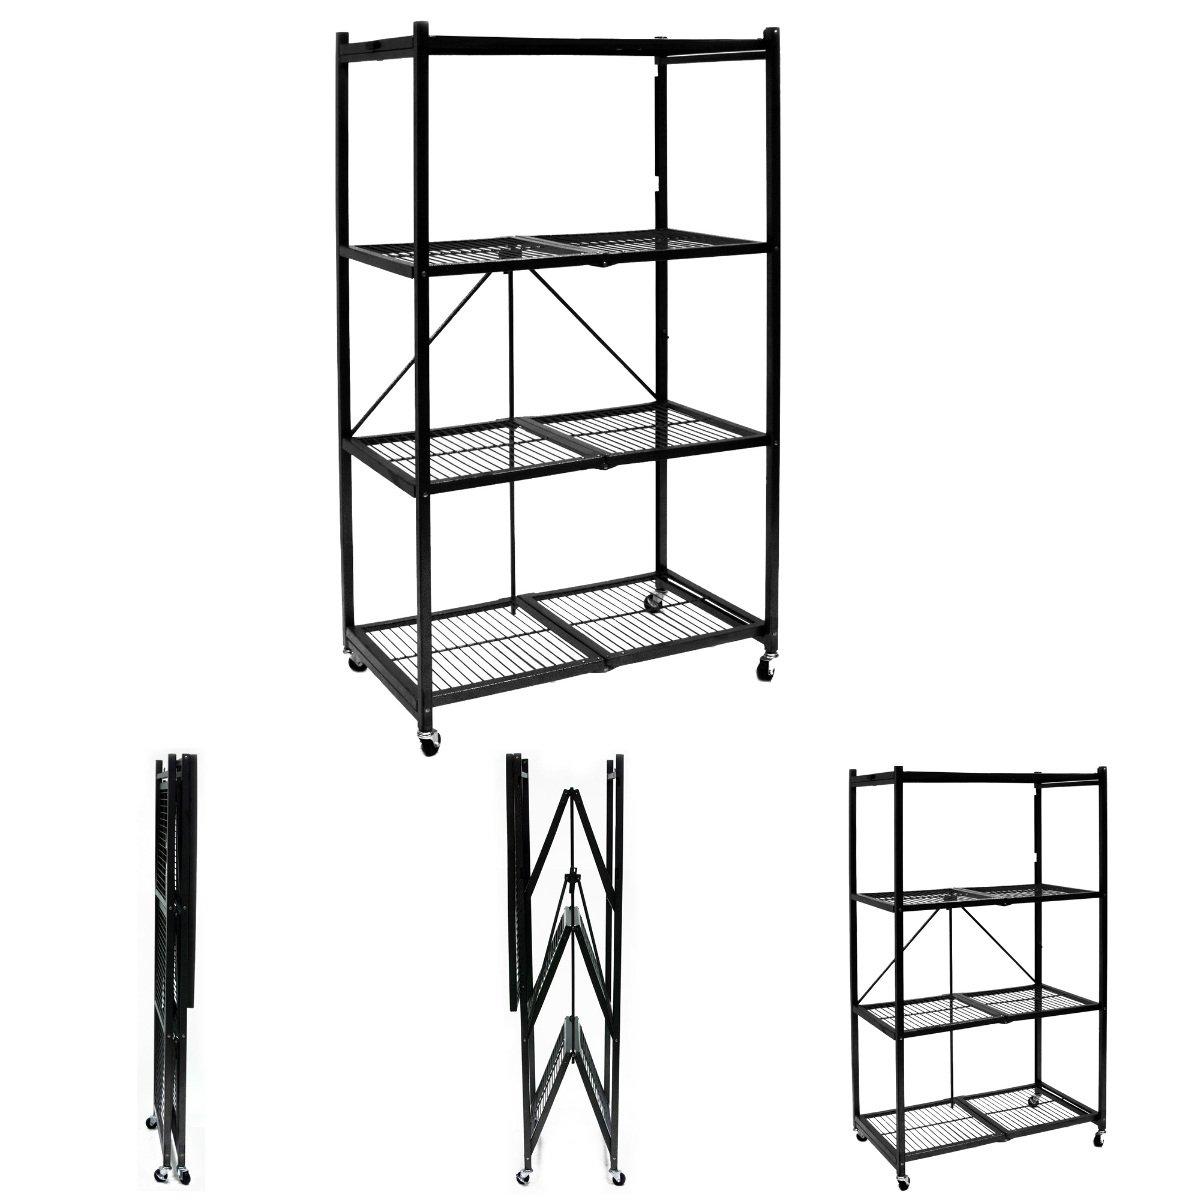 Origami Storage Solutions R1407W Four Shelf Steel Collapsible Garage Storage Rack w/ Wheels by Pop It